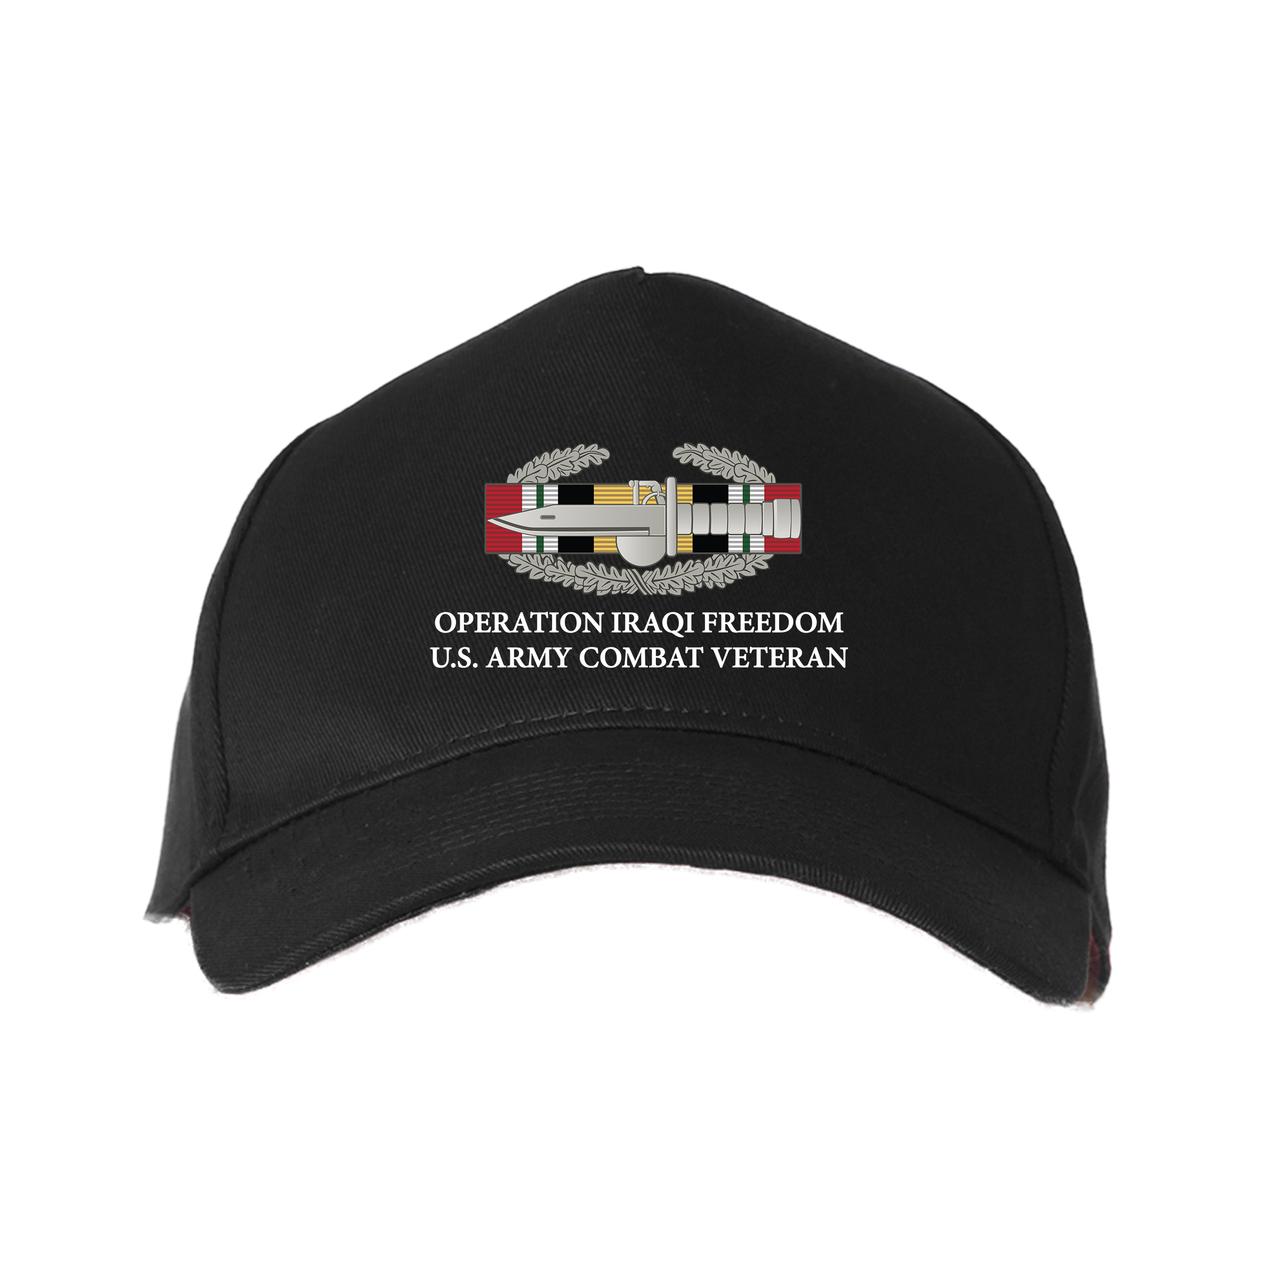 00578c66b8d Operation Iraqi Freedom-CAB- Embroidered Baseball Cap